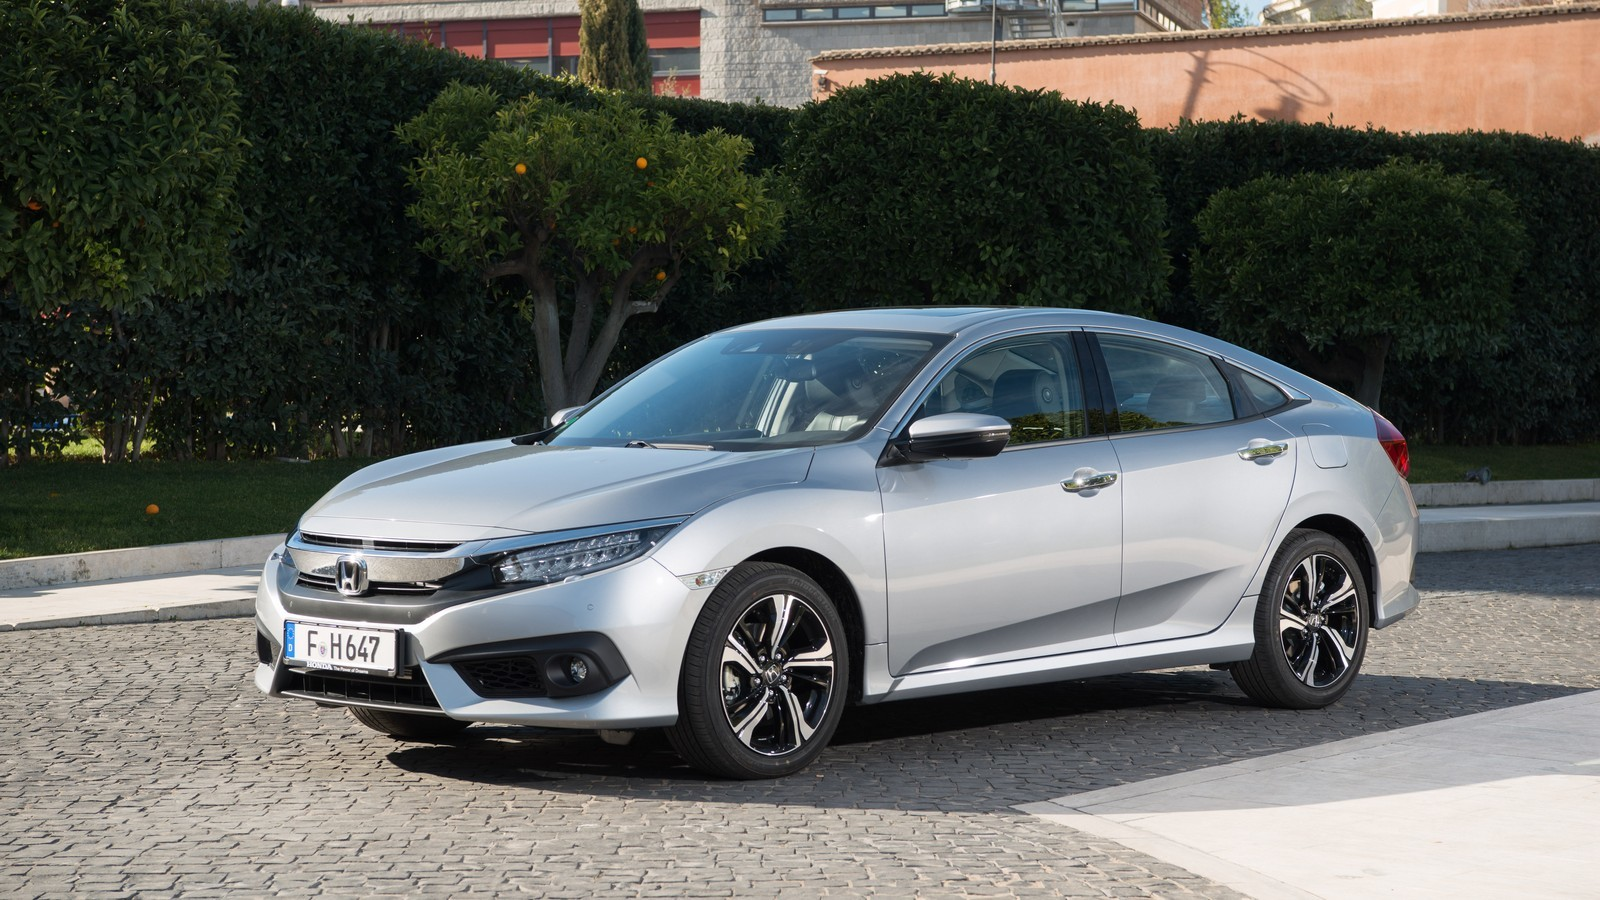 Honda Civic 4 puertas